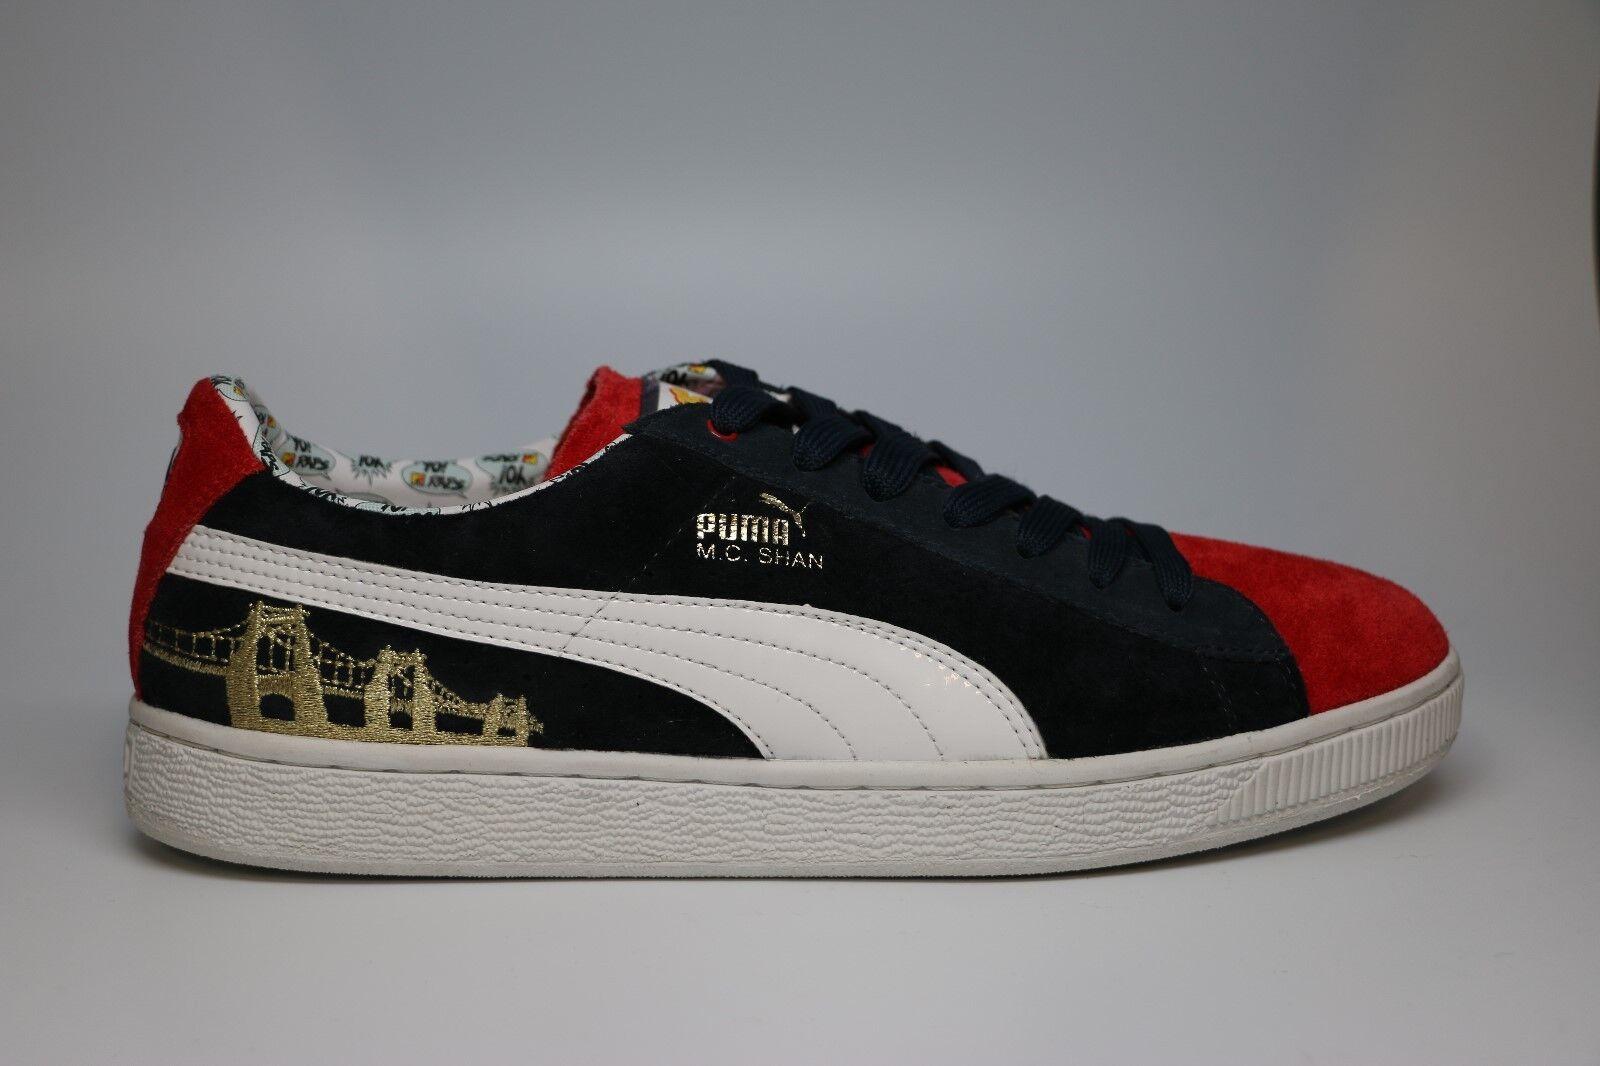 PUMA Shoes MC Shan Suede MTV Raps 2 Navy Blueredwhite SNEAKERS Size 7.5